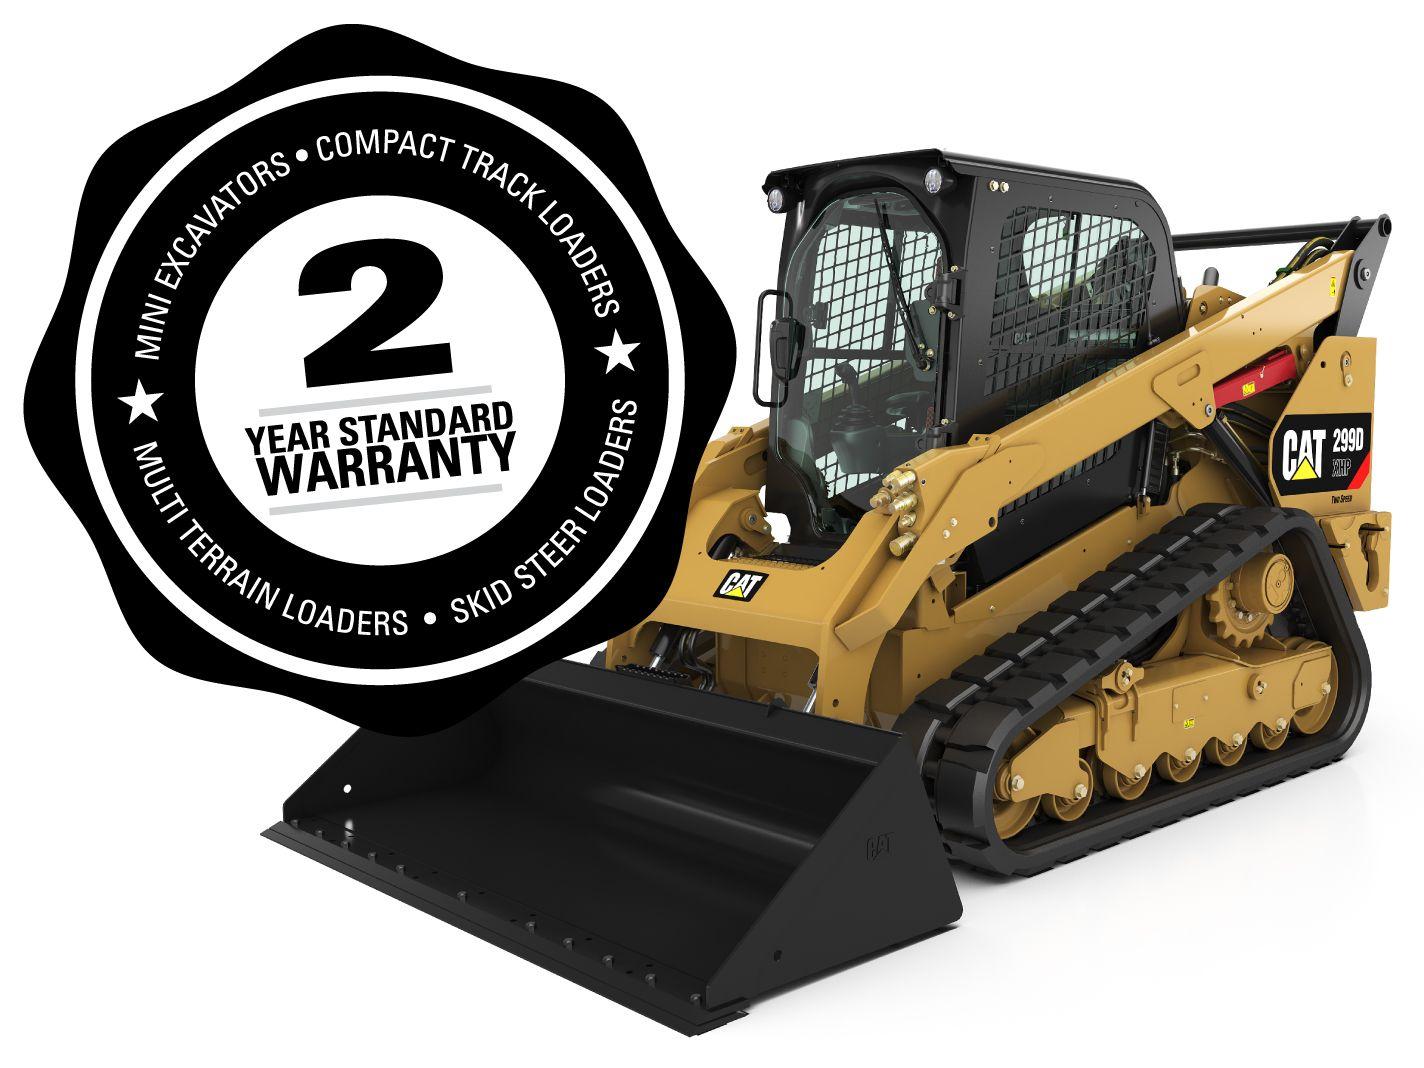 New, 2-Year Standard Warranty